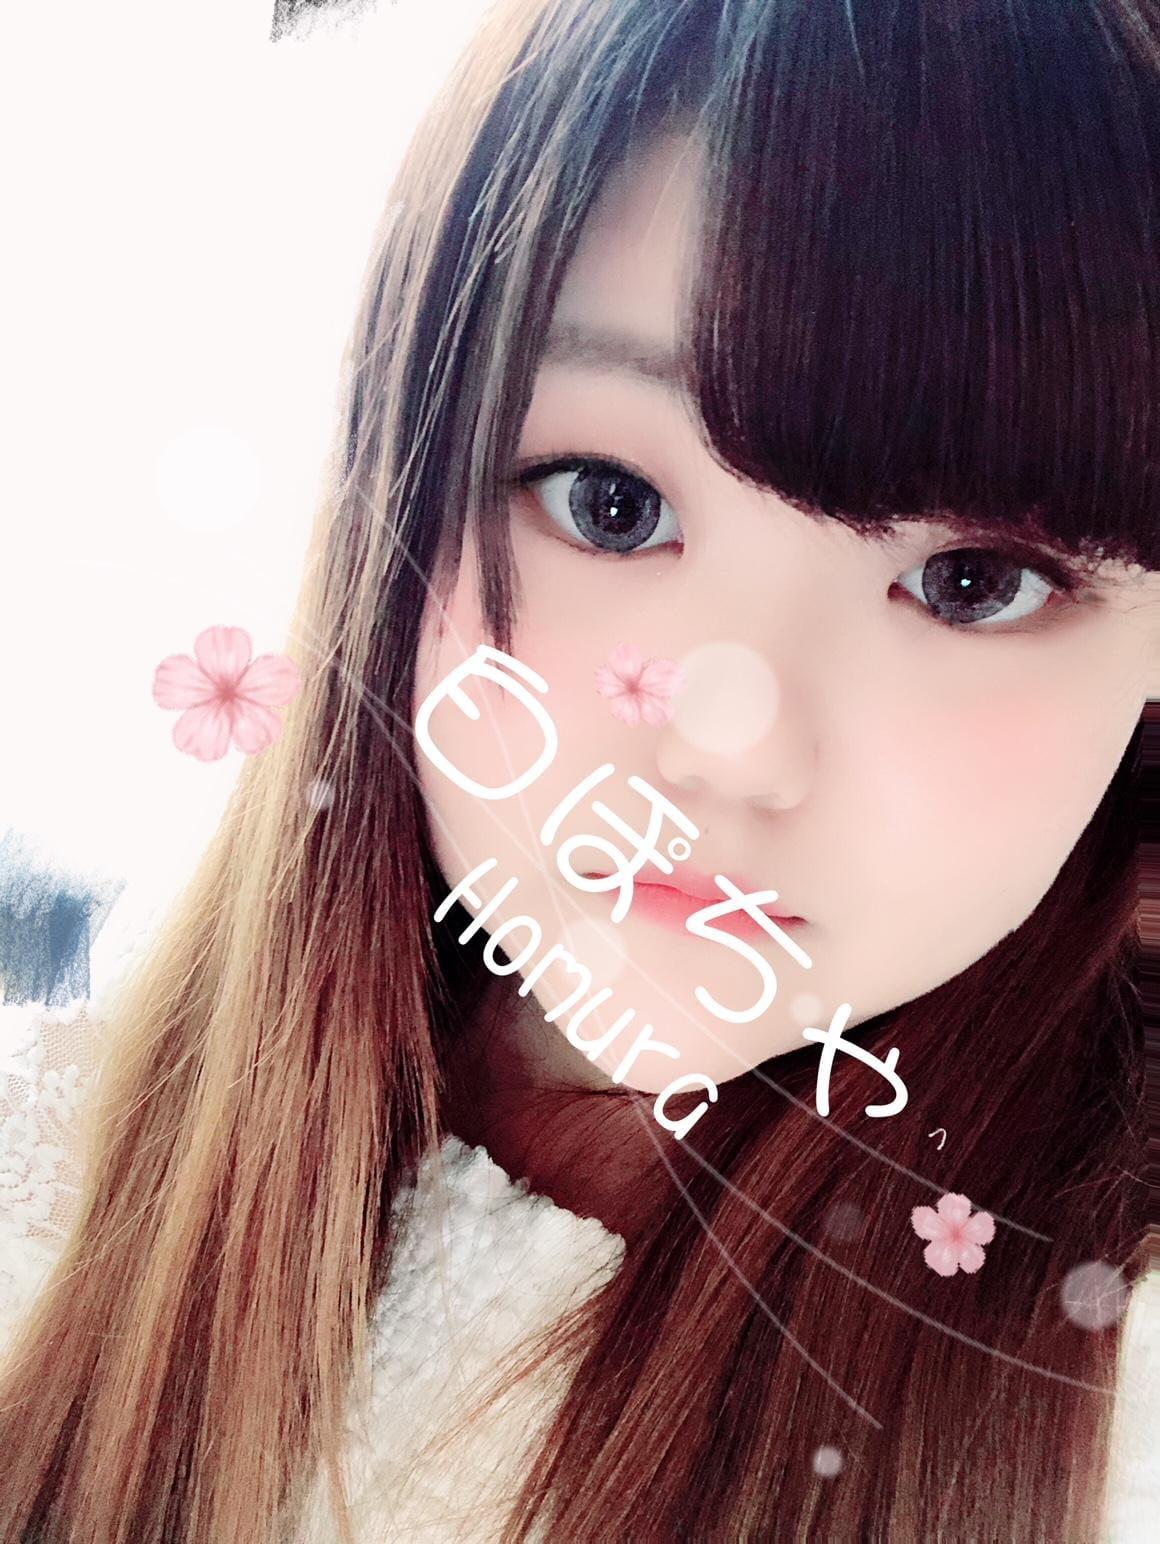 https://s3-ap-northeast-1.amazonaws.com/files.deli-fuzoku.jp/img/shop/sendaisiropocha/diary/25994146/d_0_20180705151846279.jpeg